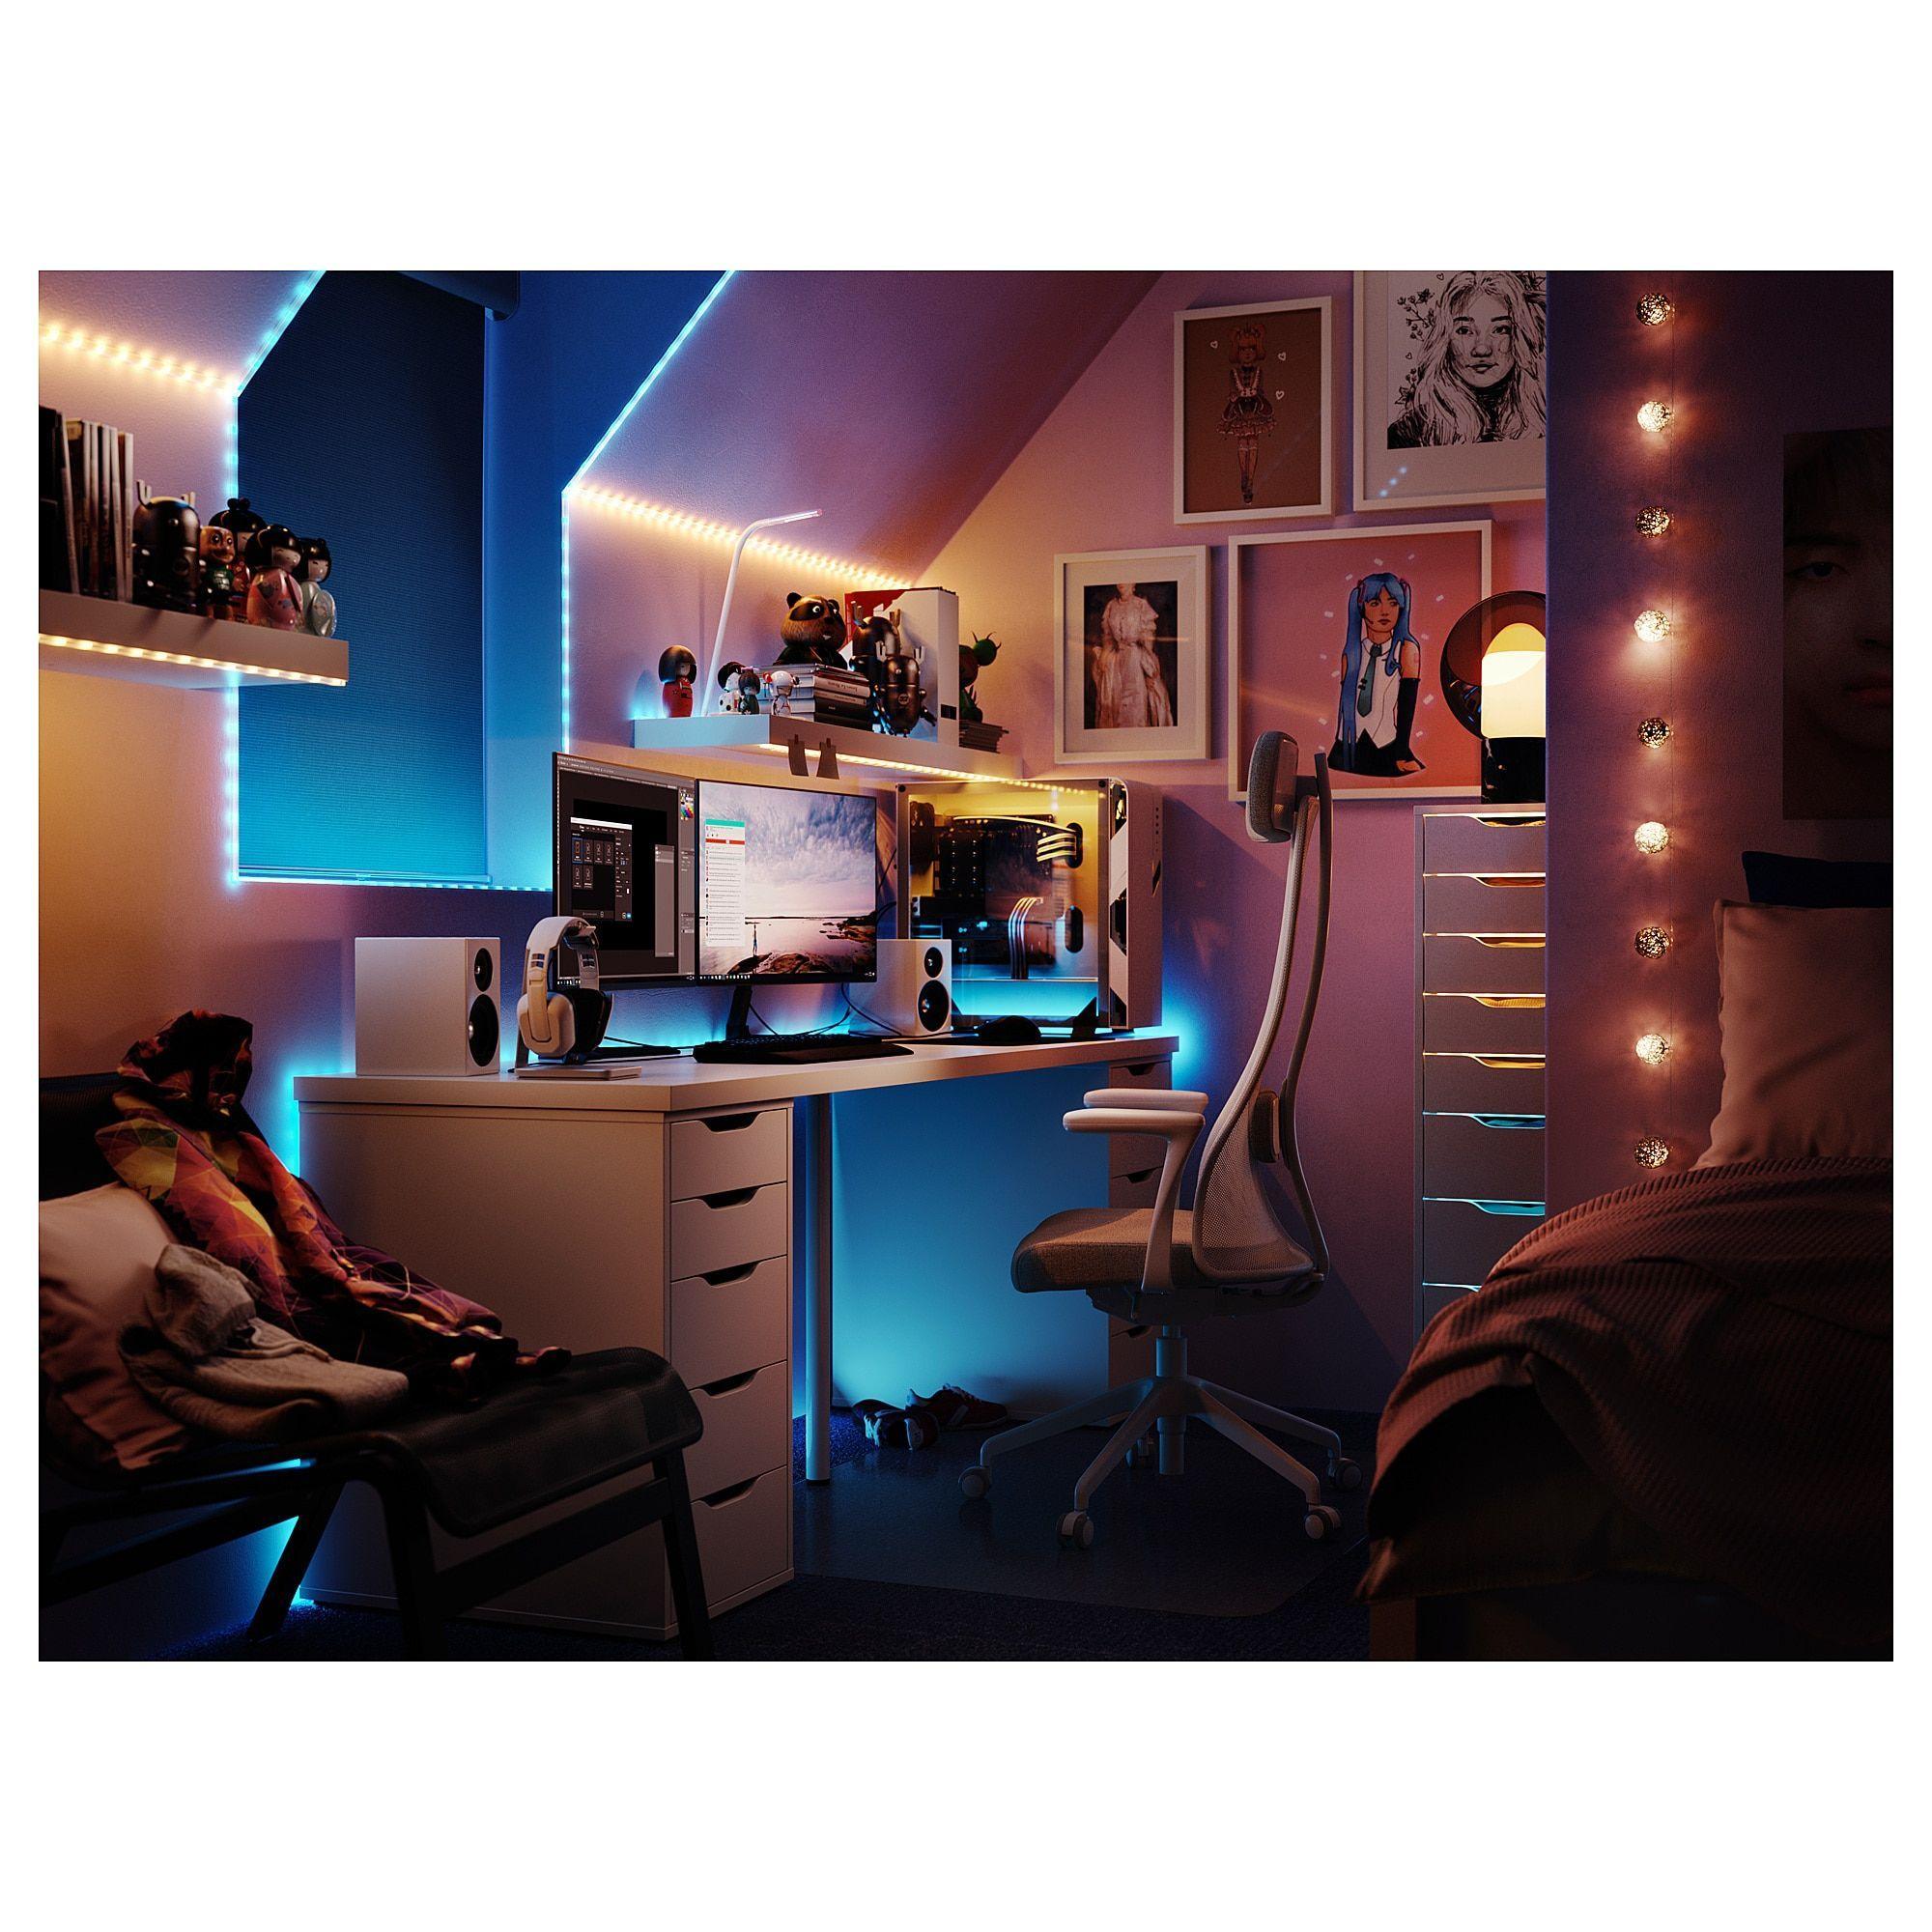 Pc Gaming Setup Discover Linnmon Alex Table White 78 3 4x23 5 8 Ikea In 2020 Room Setup Gamer Room Ikea